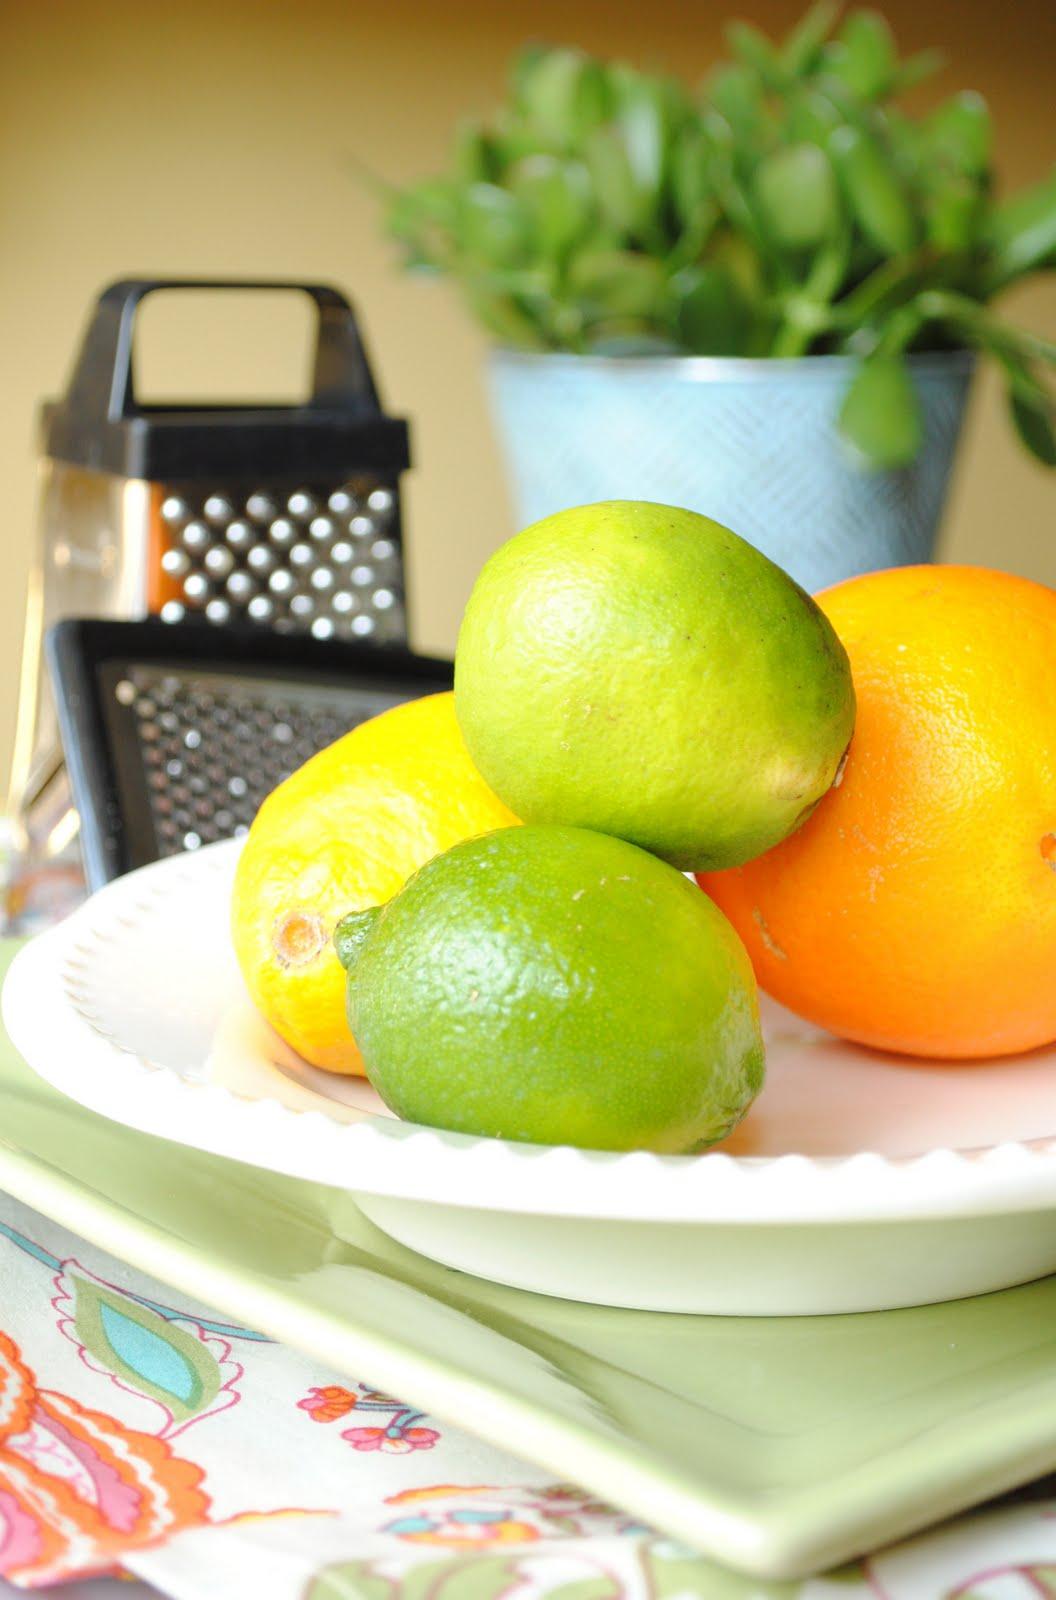 http://1.bp.blogspot.com/_DCOTj4PKf14/TJOtKpqBMDI/AAAAAAAACWg/7zb1bp_bjyM/s1600/%7BTips+and+Tricks%7D+Zesting+Fruit.JPG